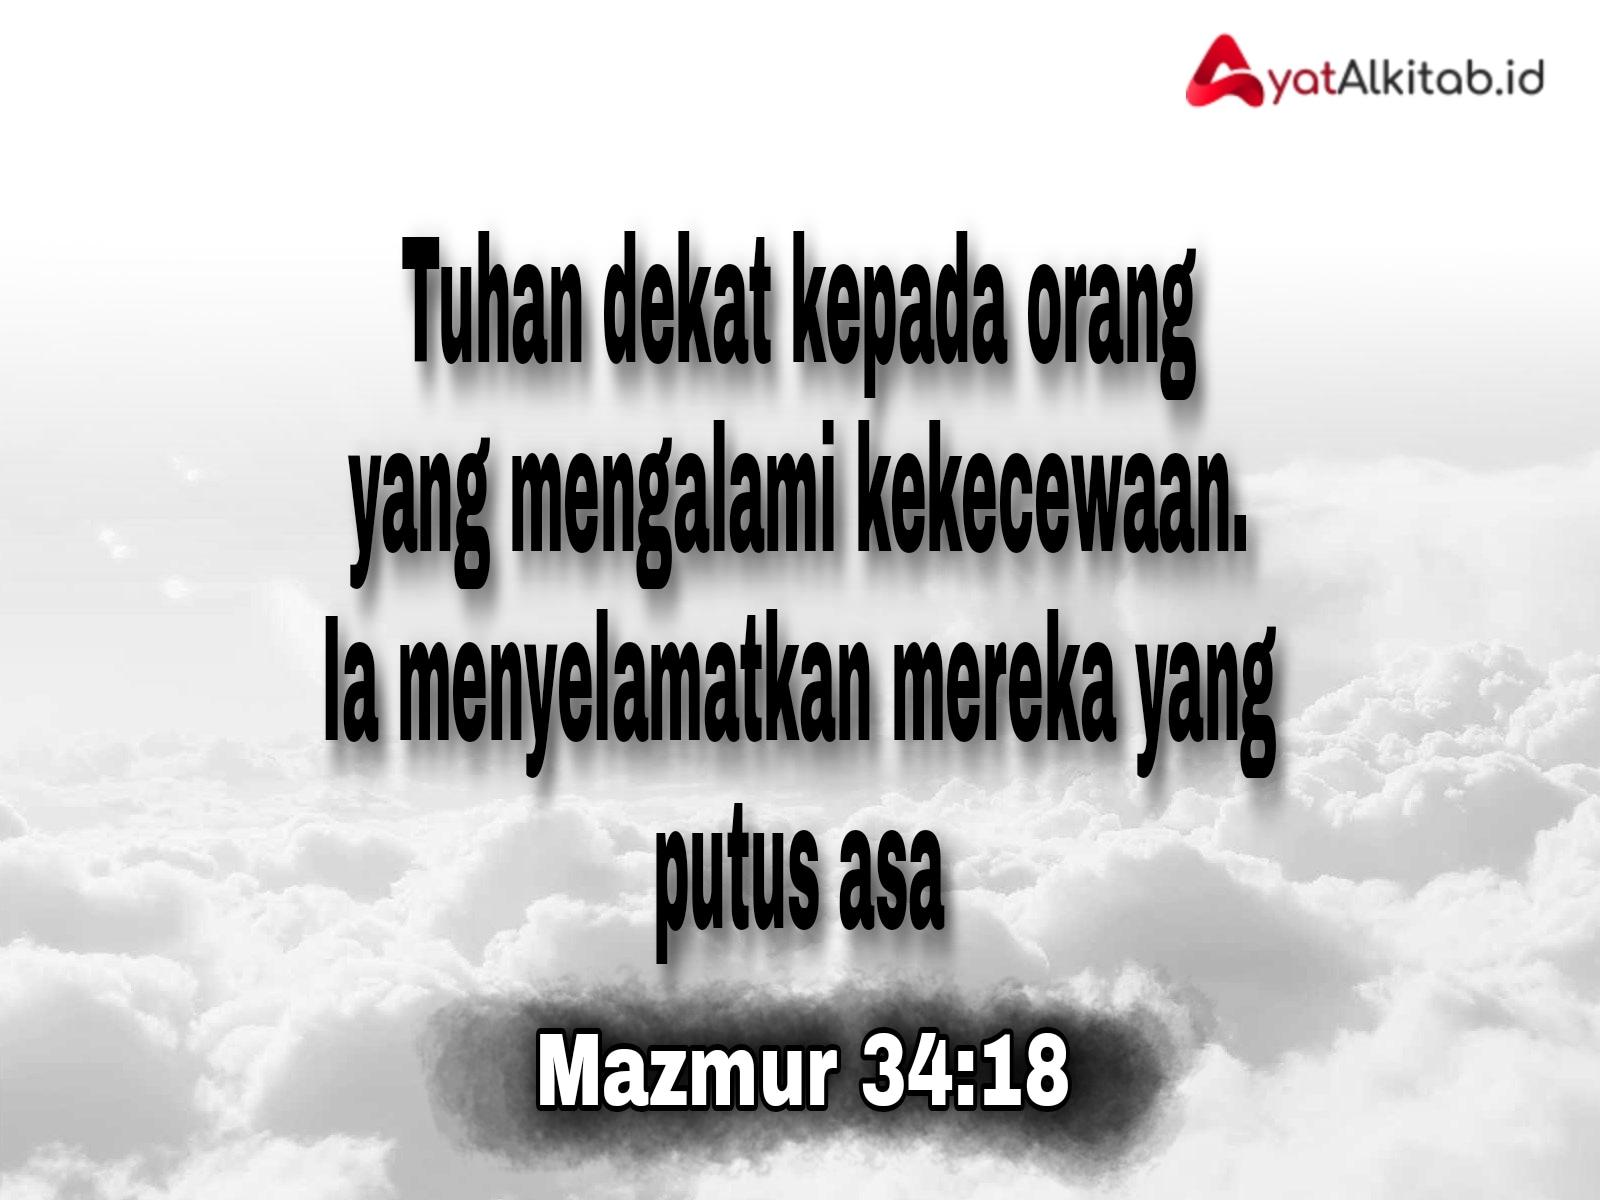 Ayat Alkitab